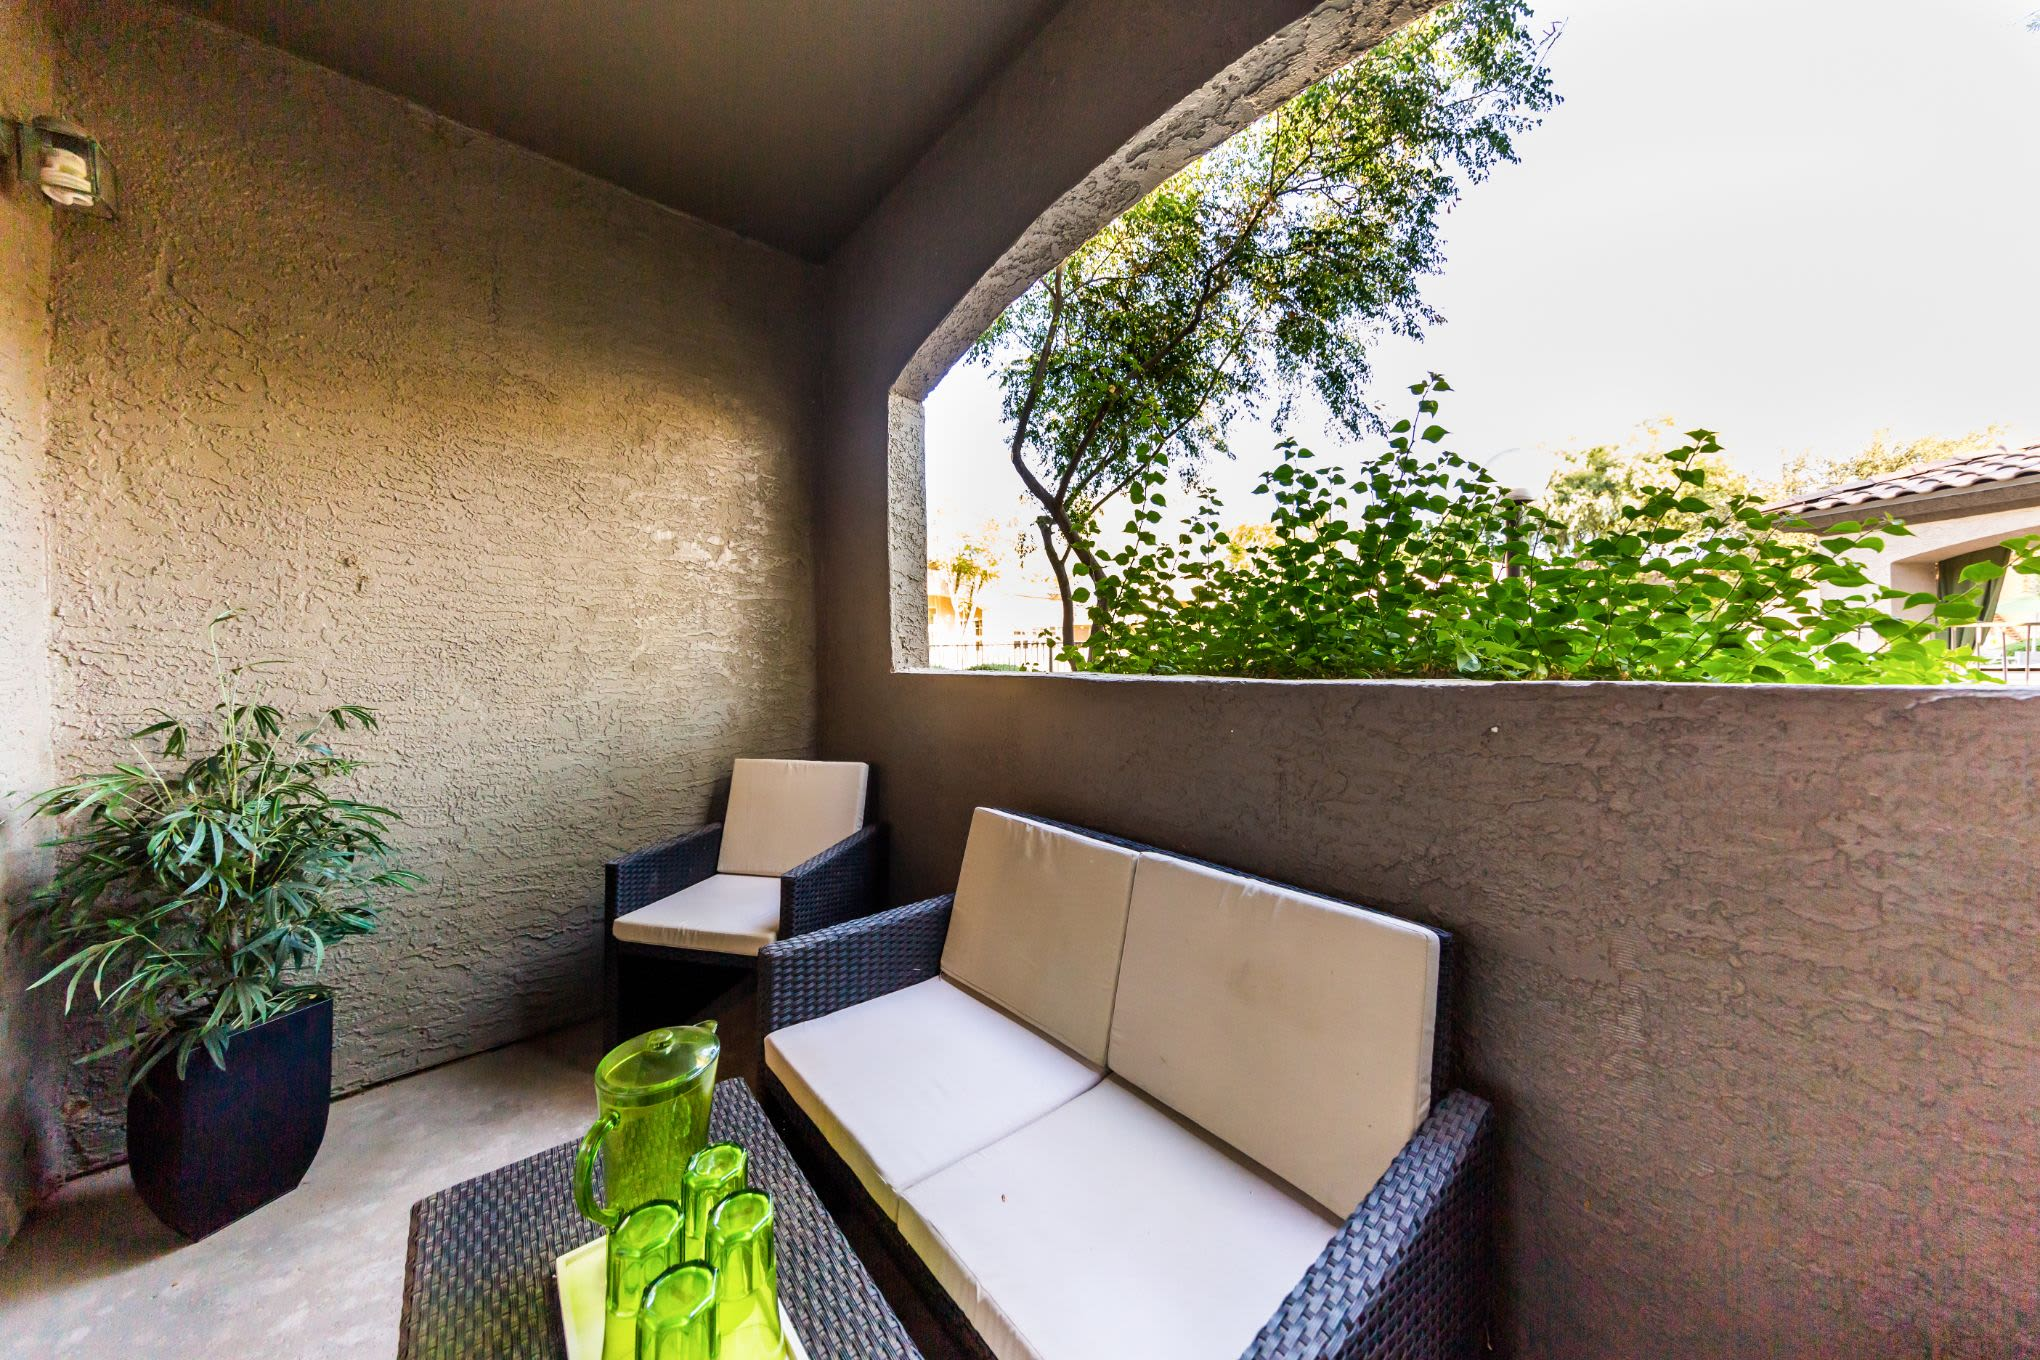 Private patio at Marquis at Arrowhead in Peoria, Arizona